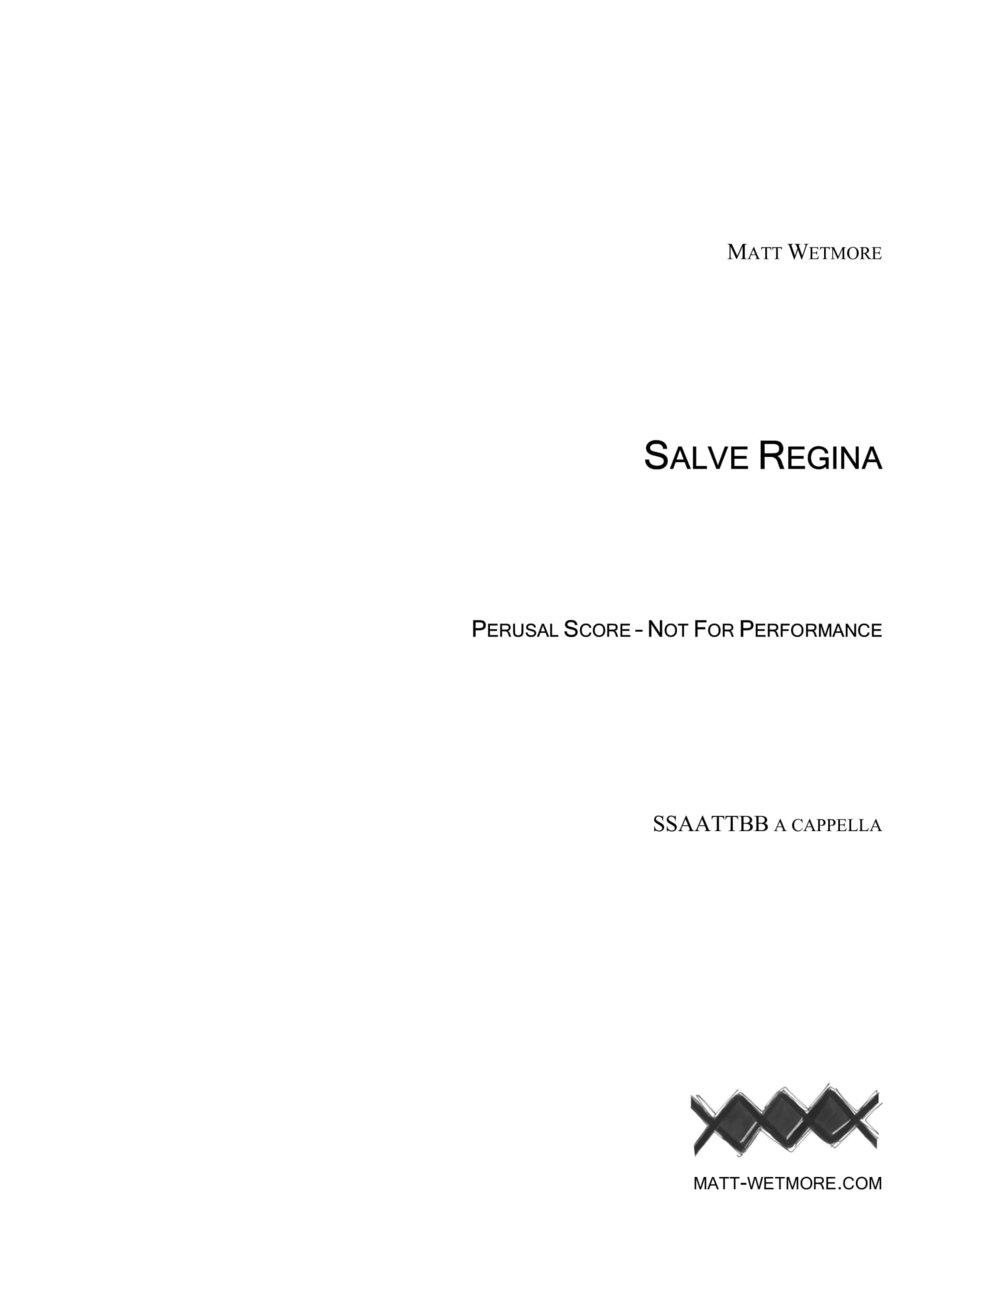 Salve Regina-perusal-01.jpg